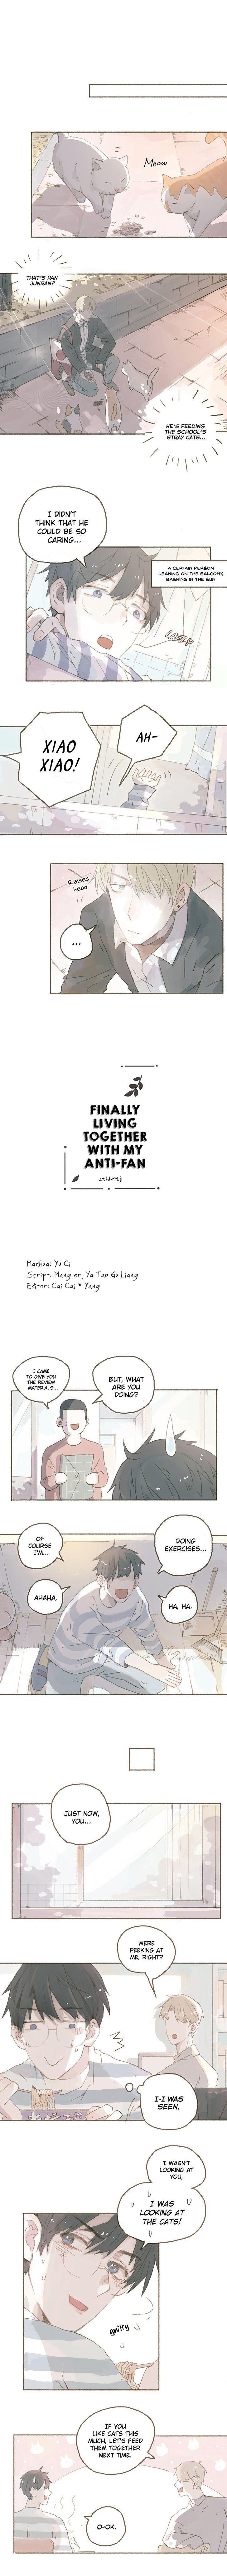 https://im.nineanime.com/comics/pic9/28/20572/417181/FinallyLivingTogetherwithm0329.jpg Page 1